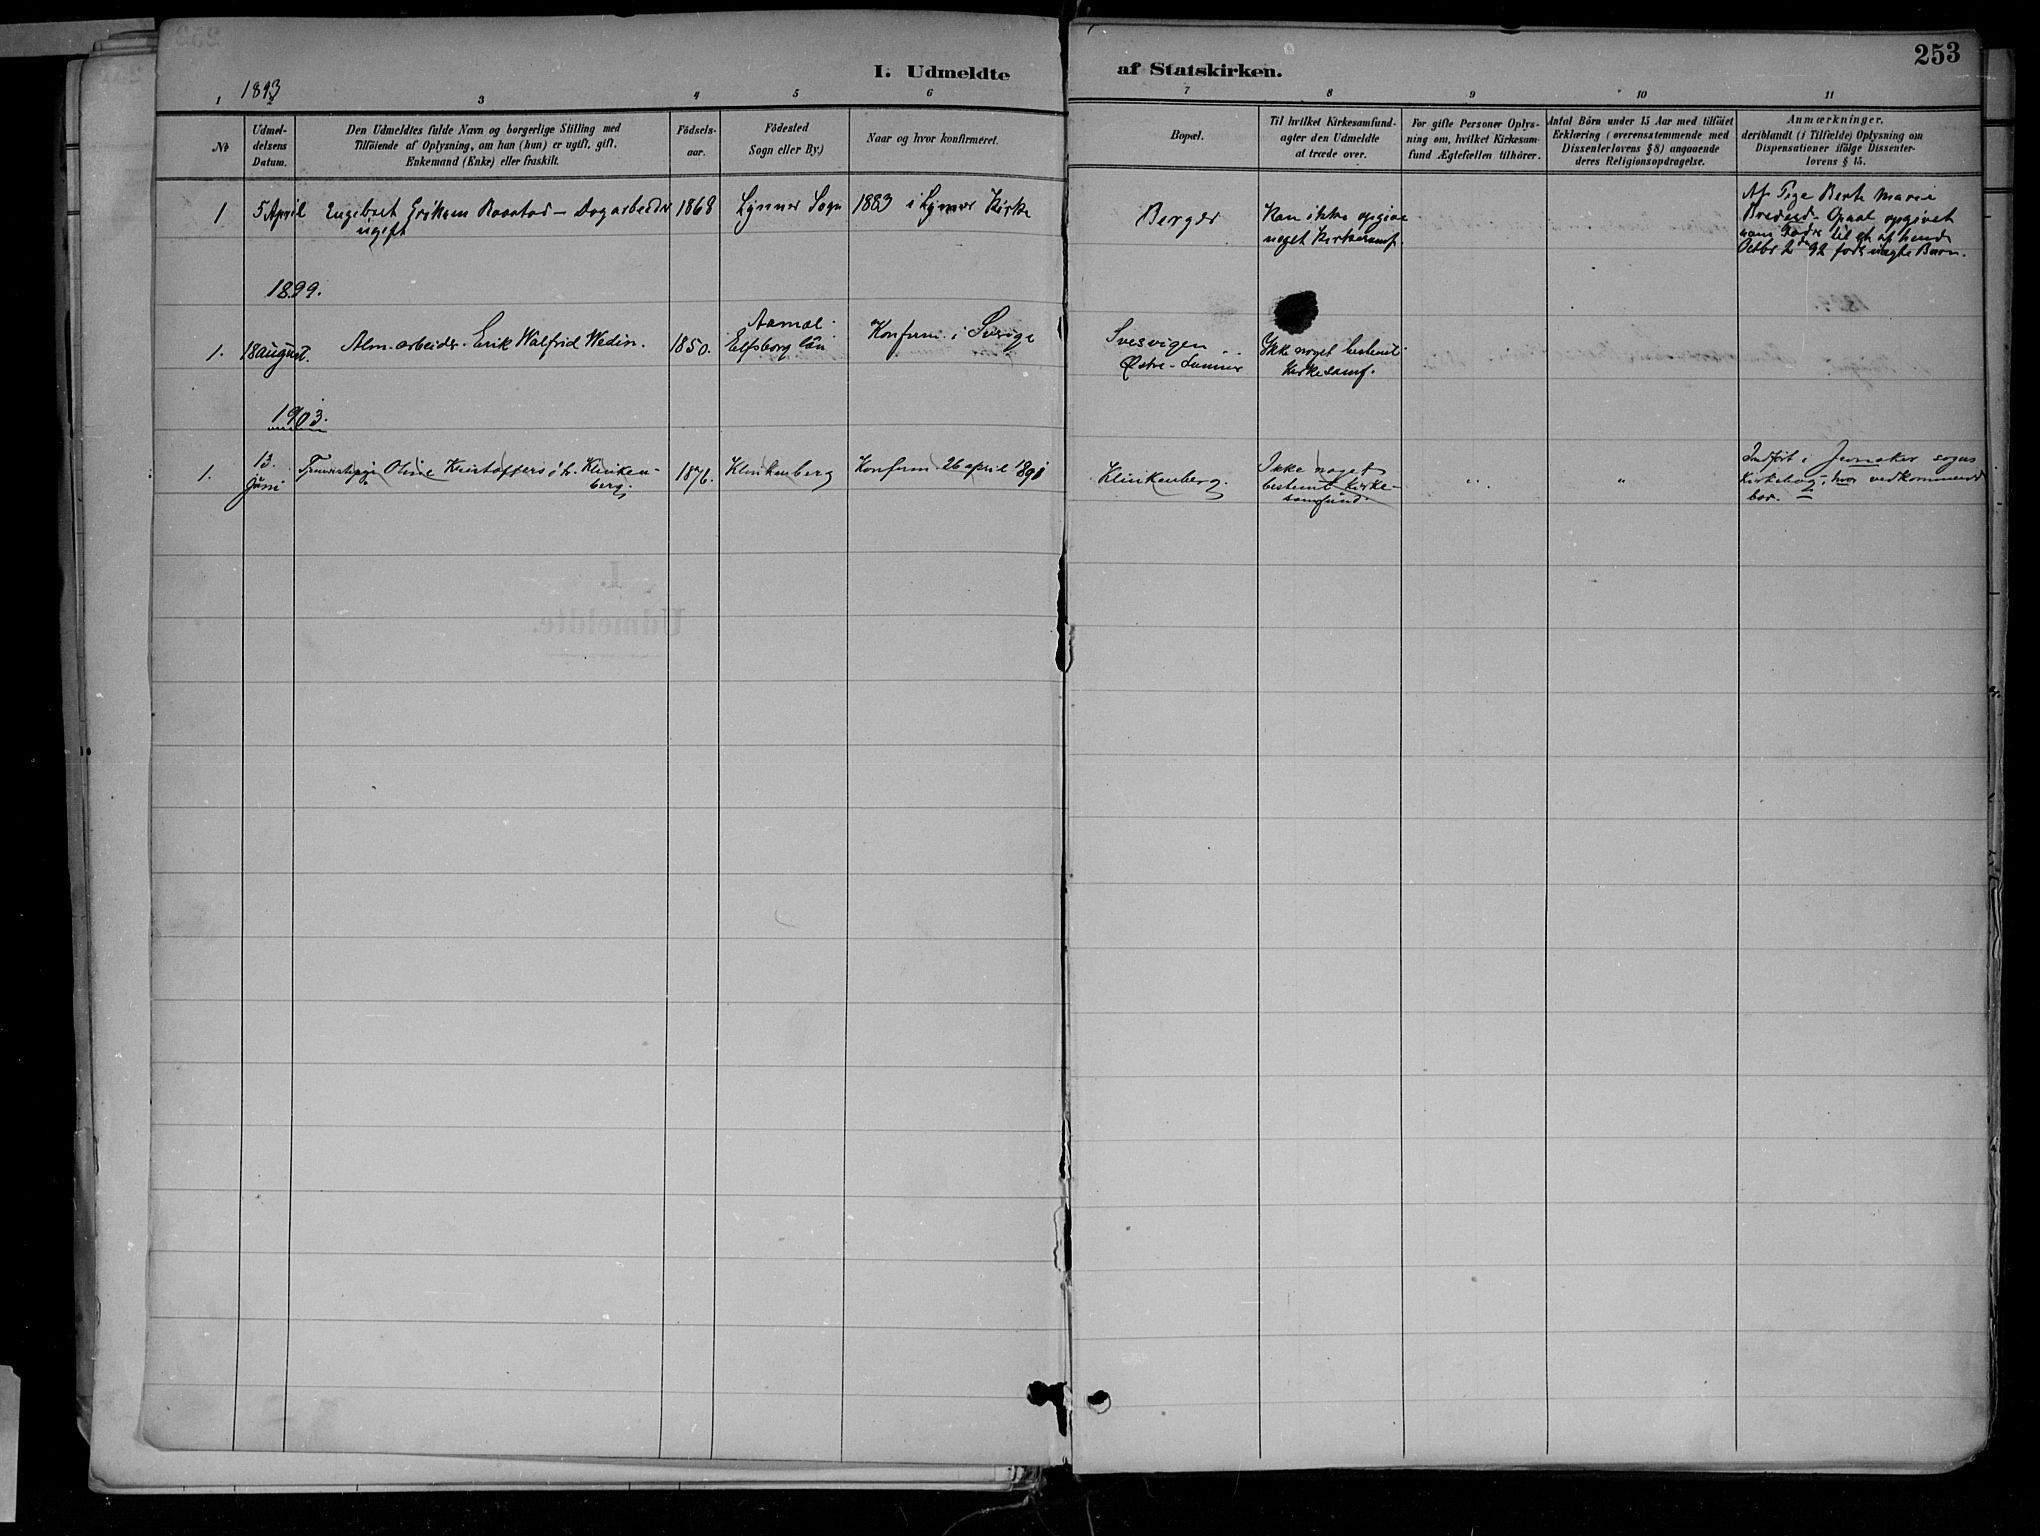 SAH, Jevnaker prestekontor, Ministerialbok nr. 10, 1891-1906, s. 253